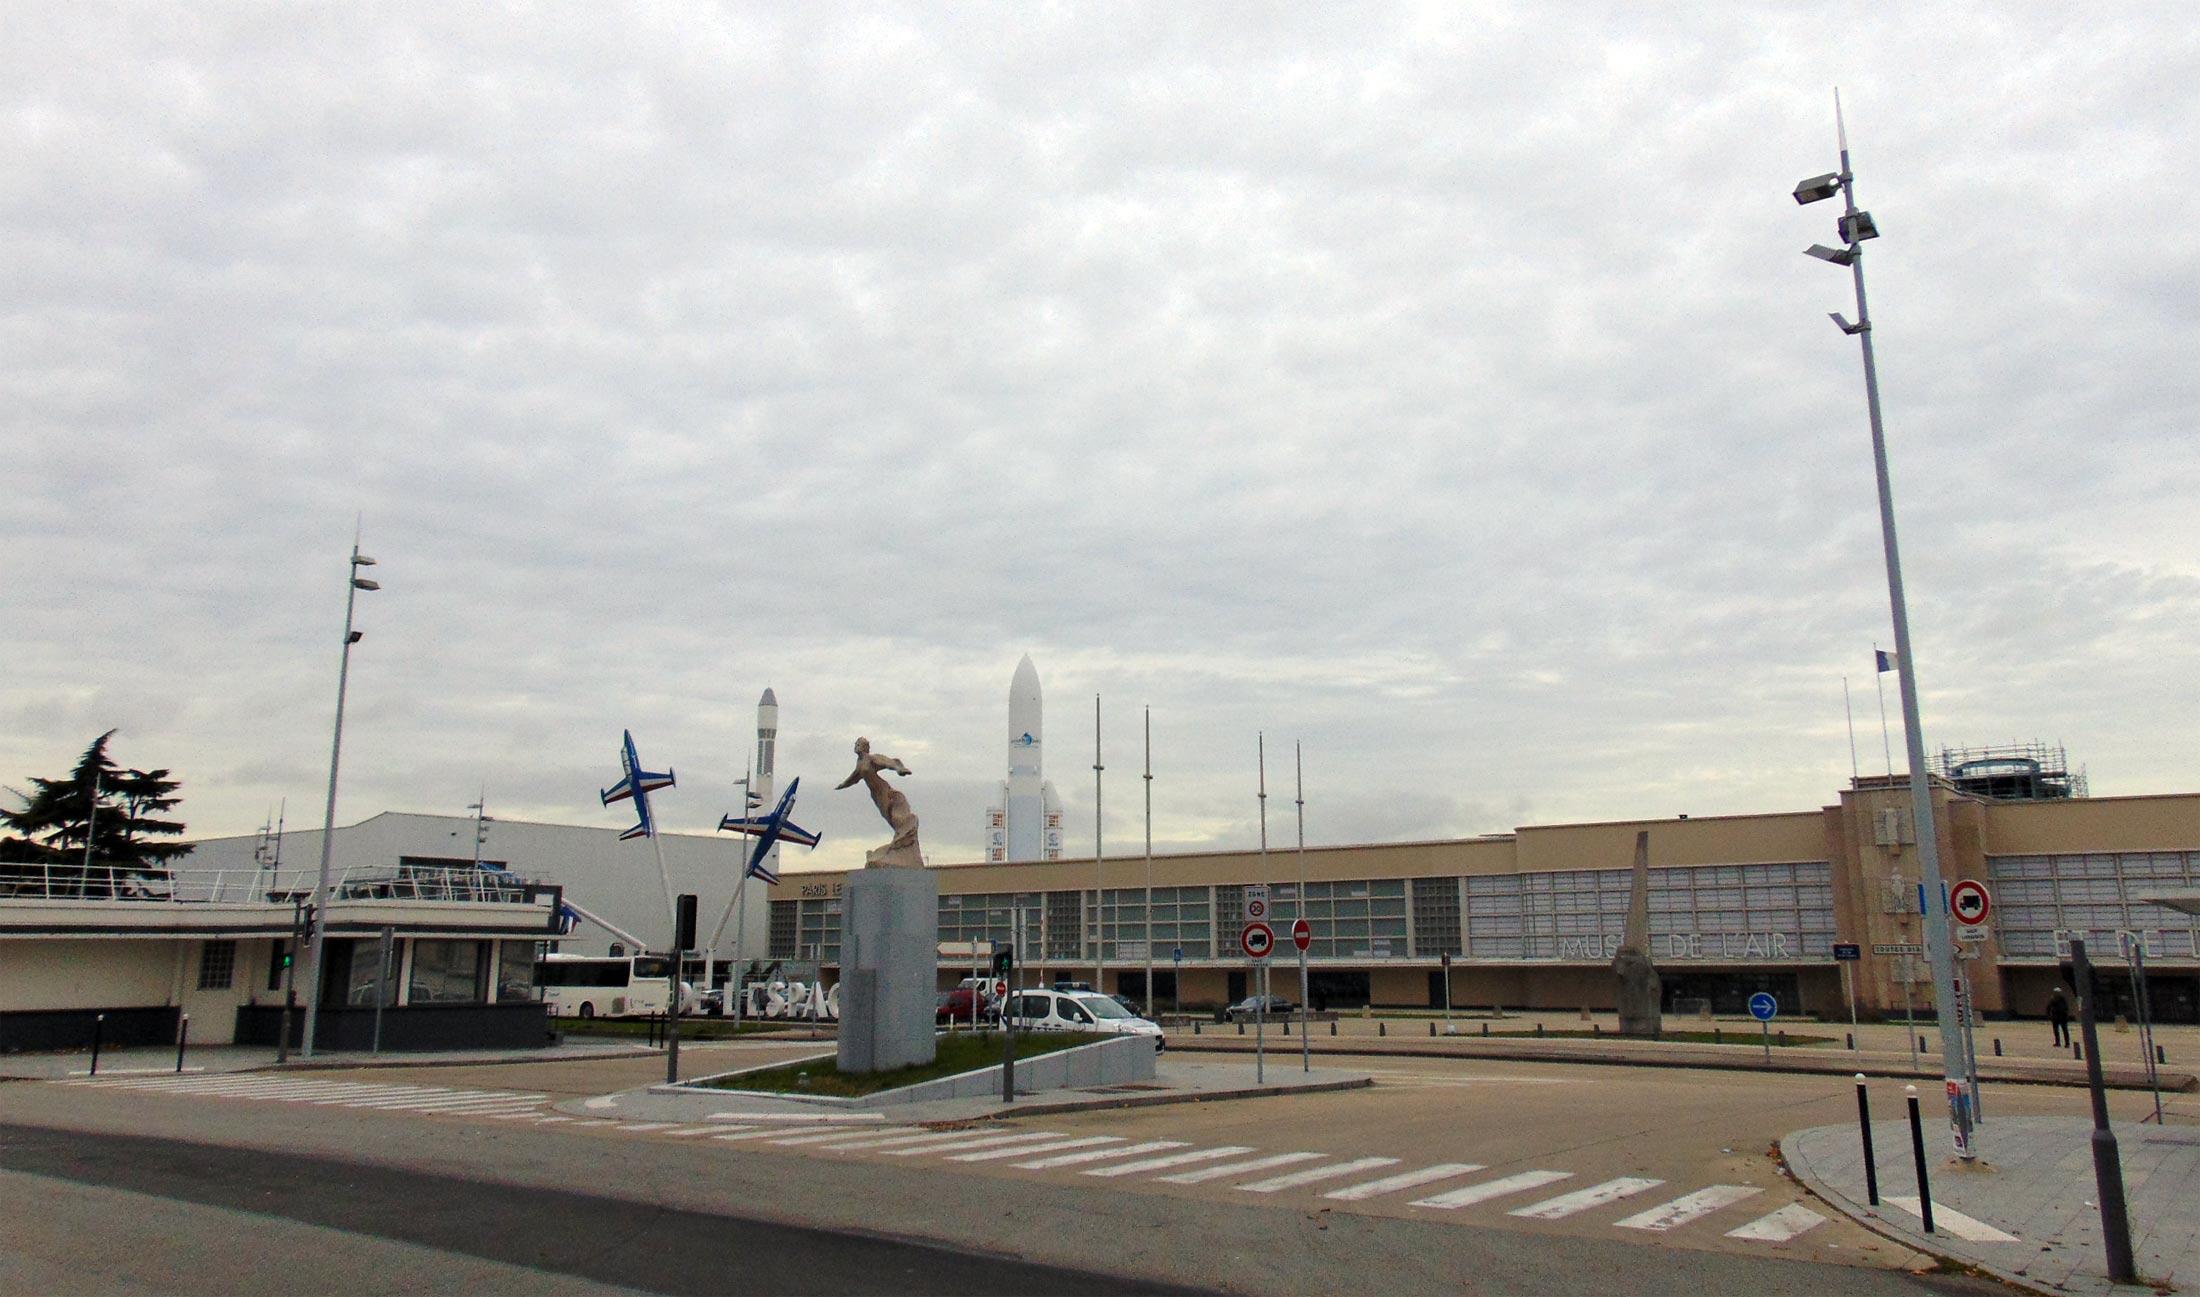 Музей авиации и космонавтики Ле Бурже